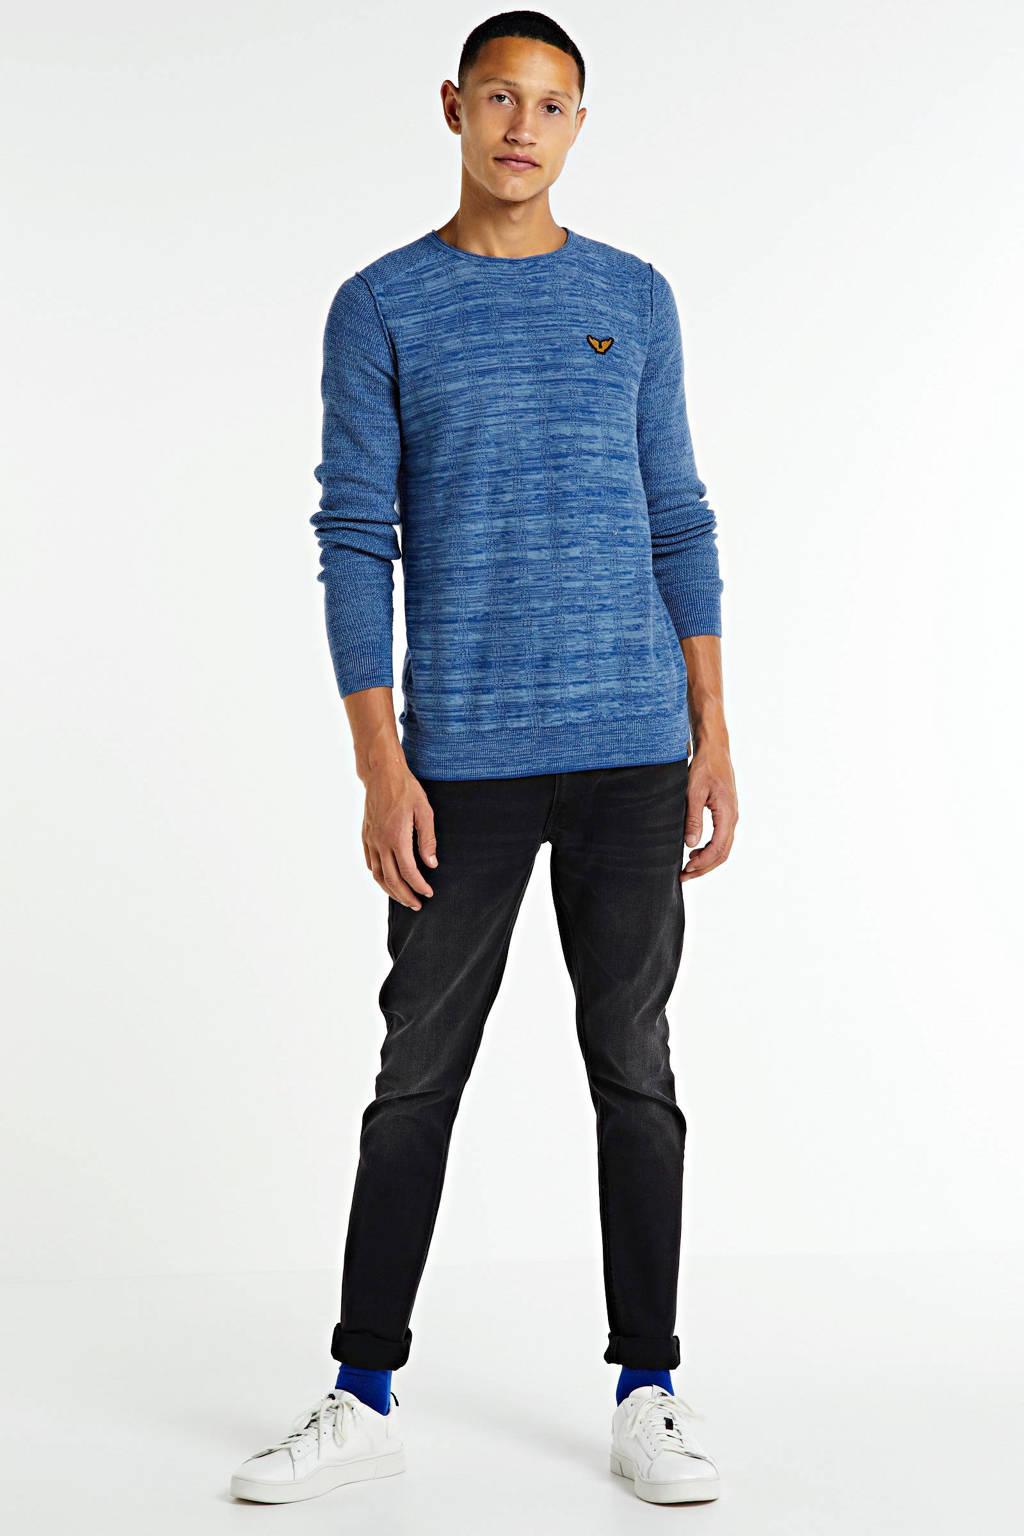 PME Legend gemêleerde trui blauw, Blauw